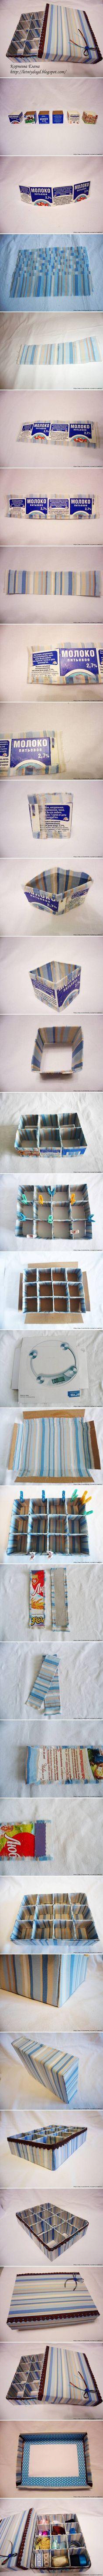 DIY Organizer with Divider